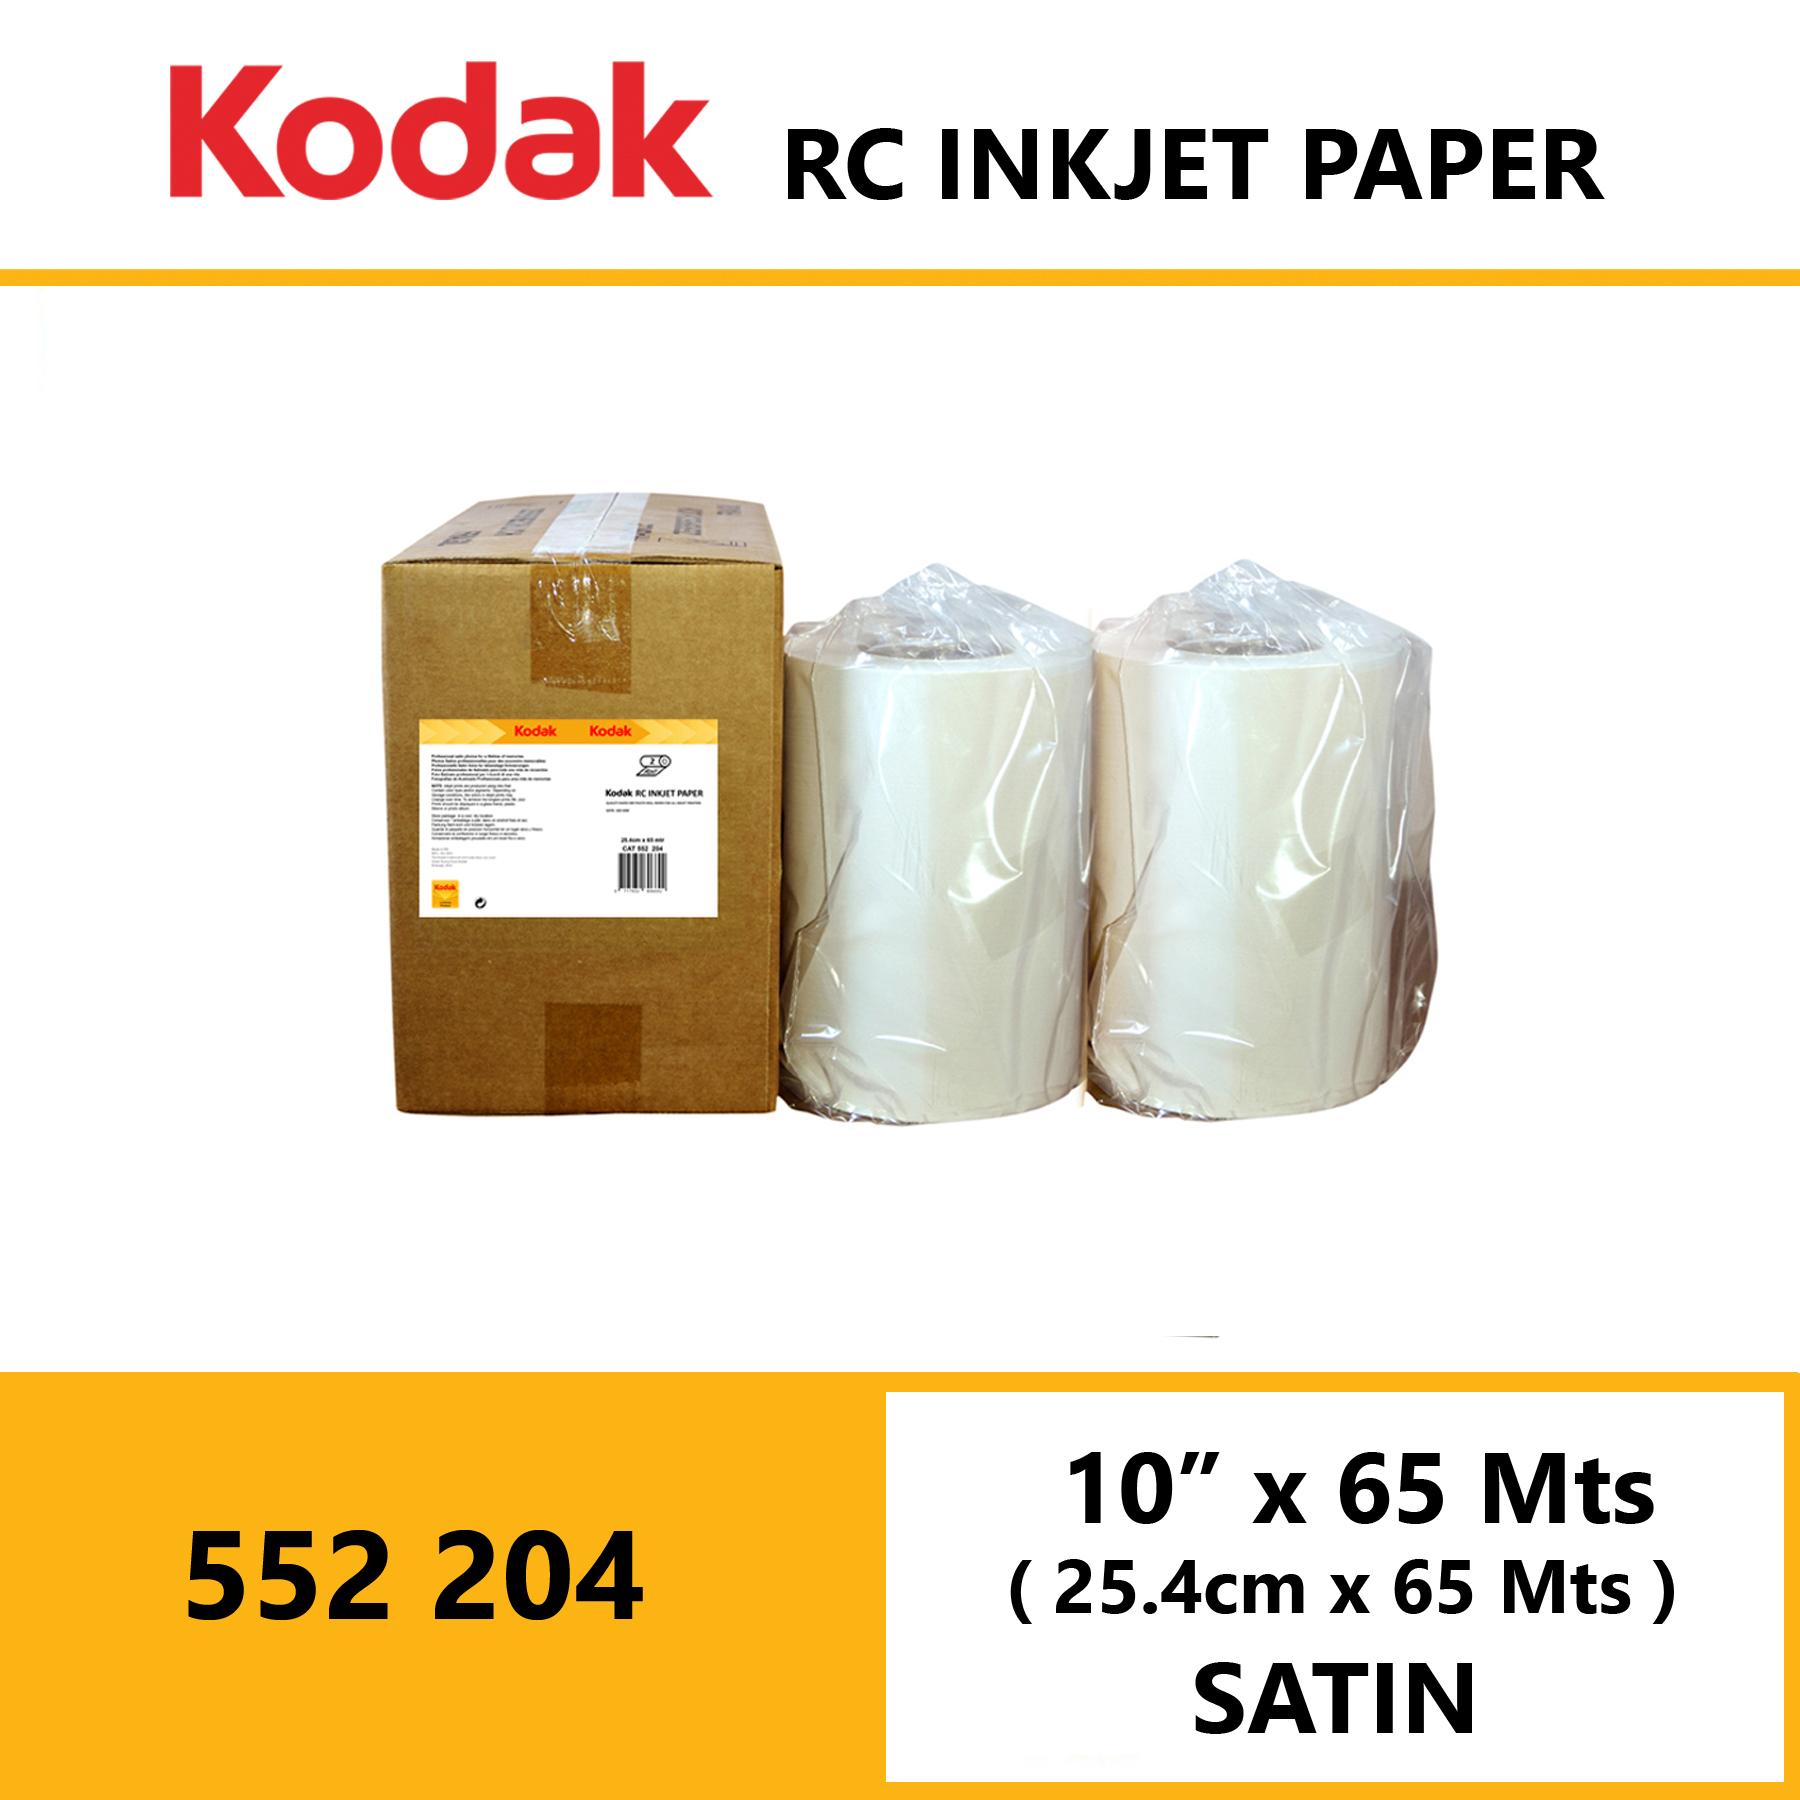 "Kodak Inkjet RC Paper 10 "" x 65 Mtrs Satin"